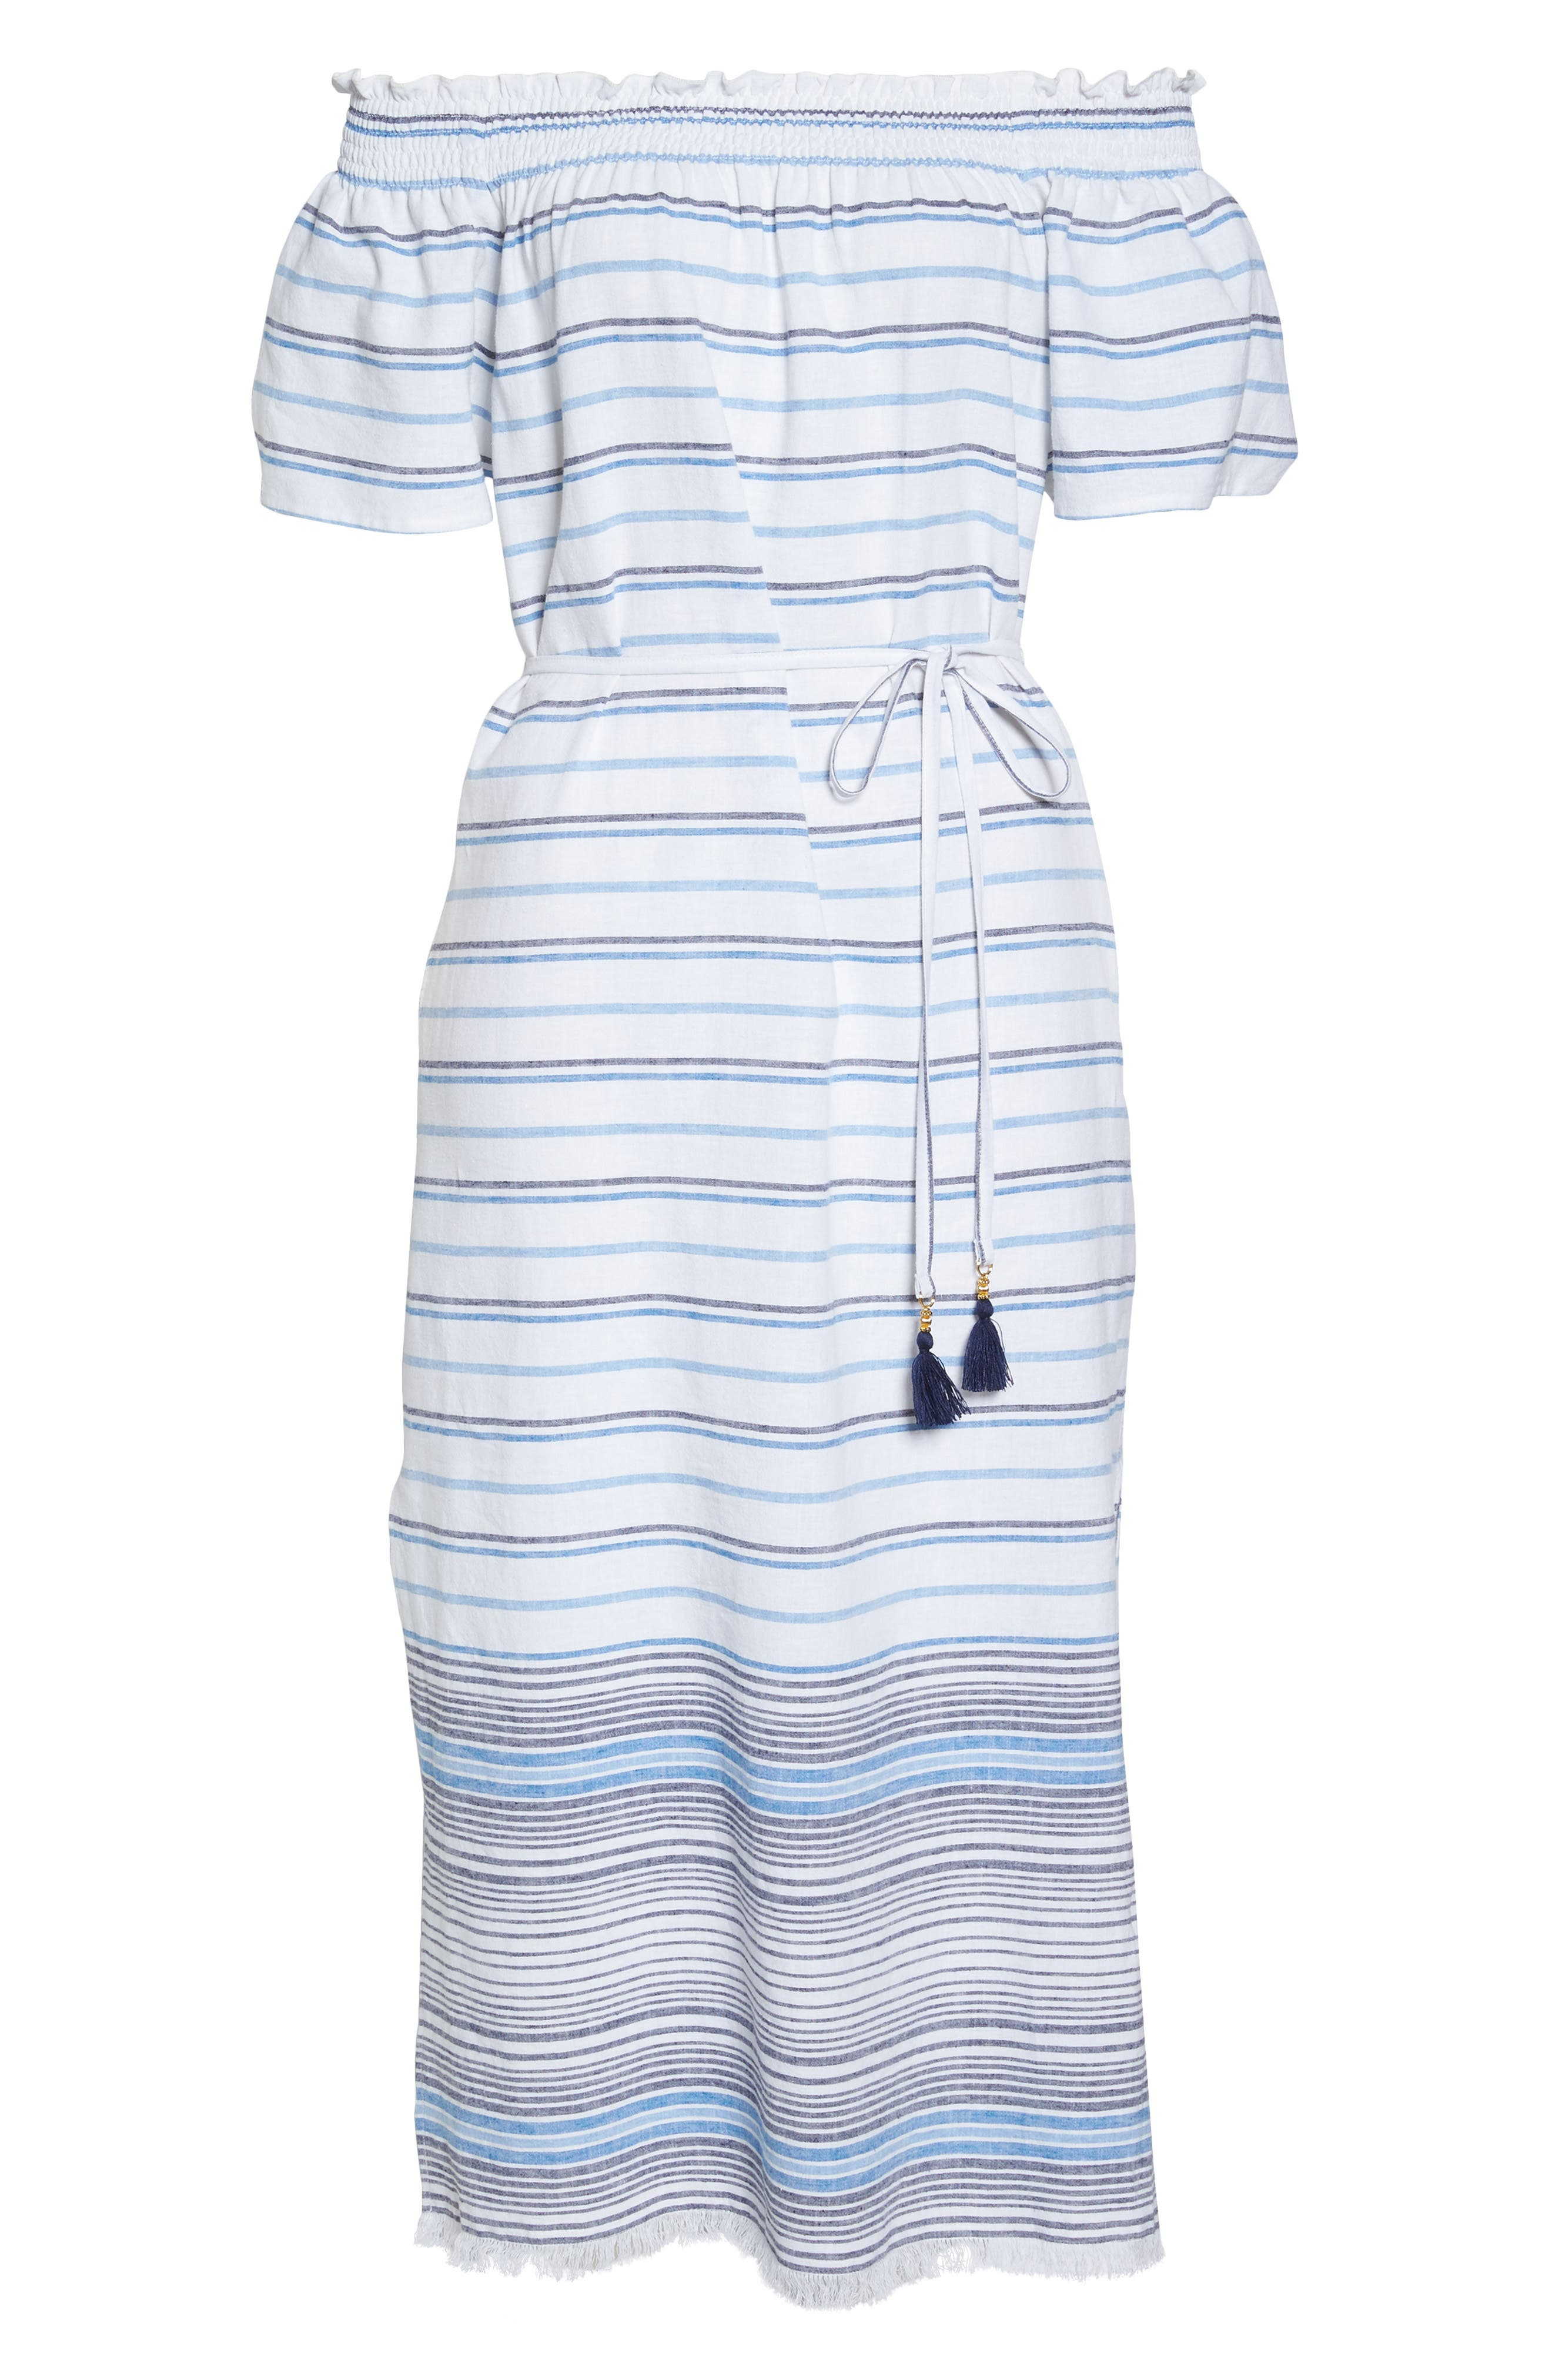 Stripe Linen & Cotton Off the Shoulder Cover-Up Dress,                             Alternate thumbnail 6, color,                             White